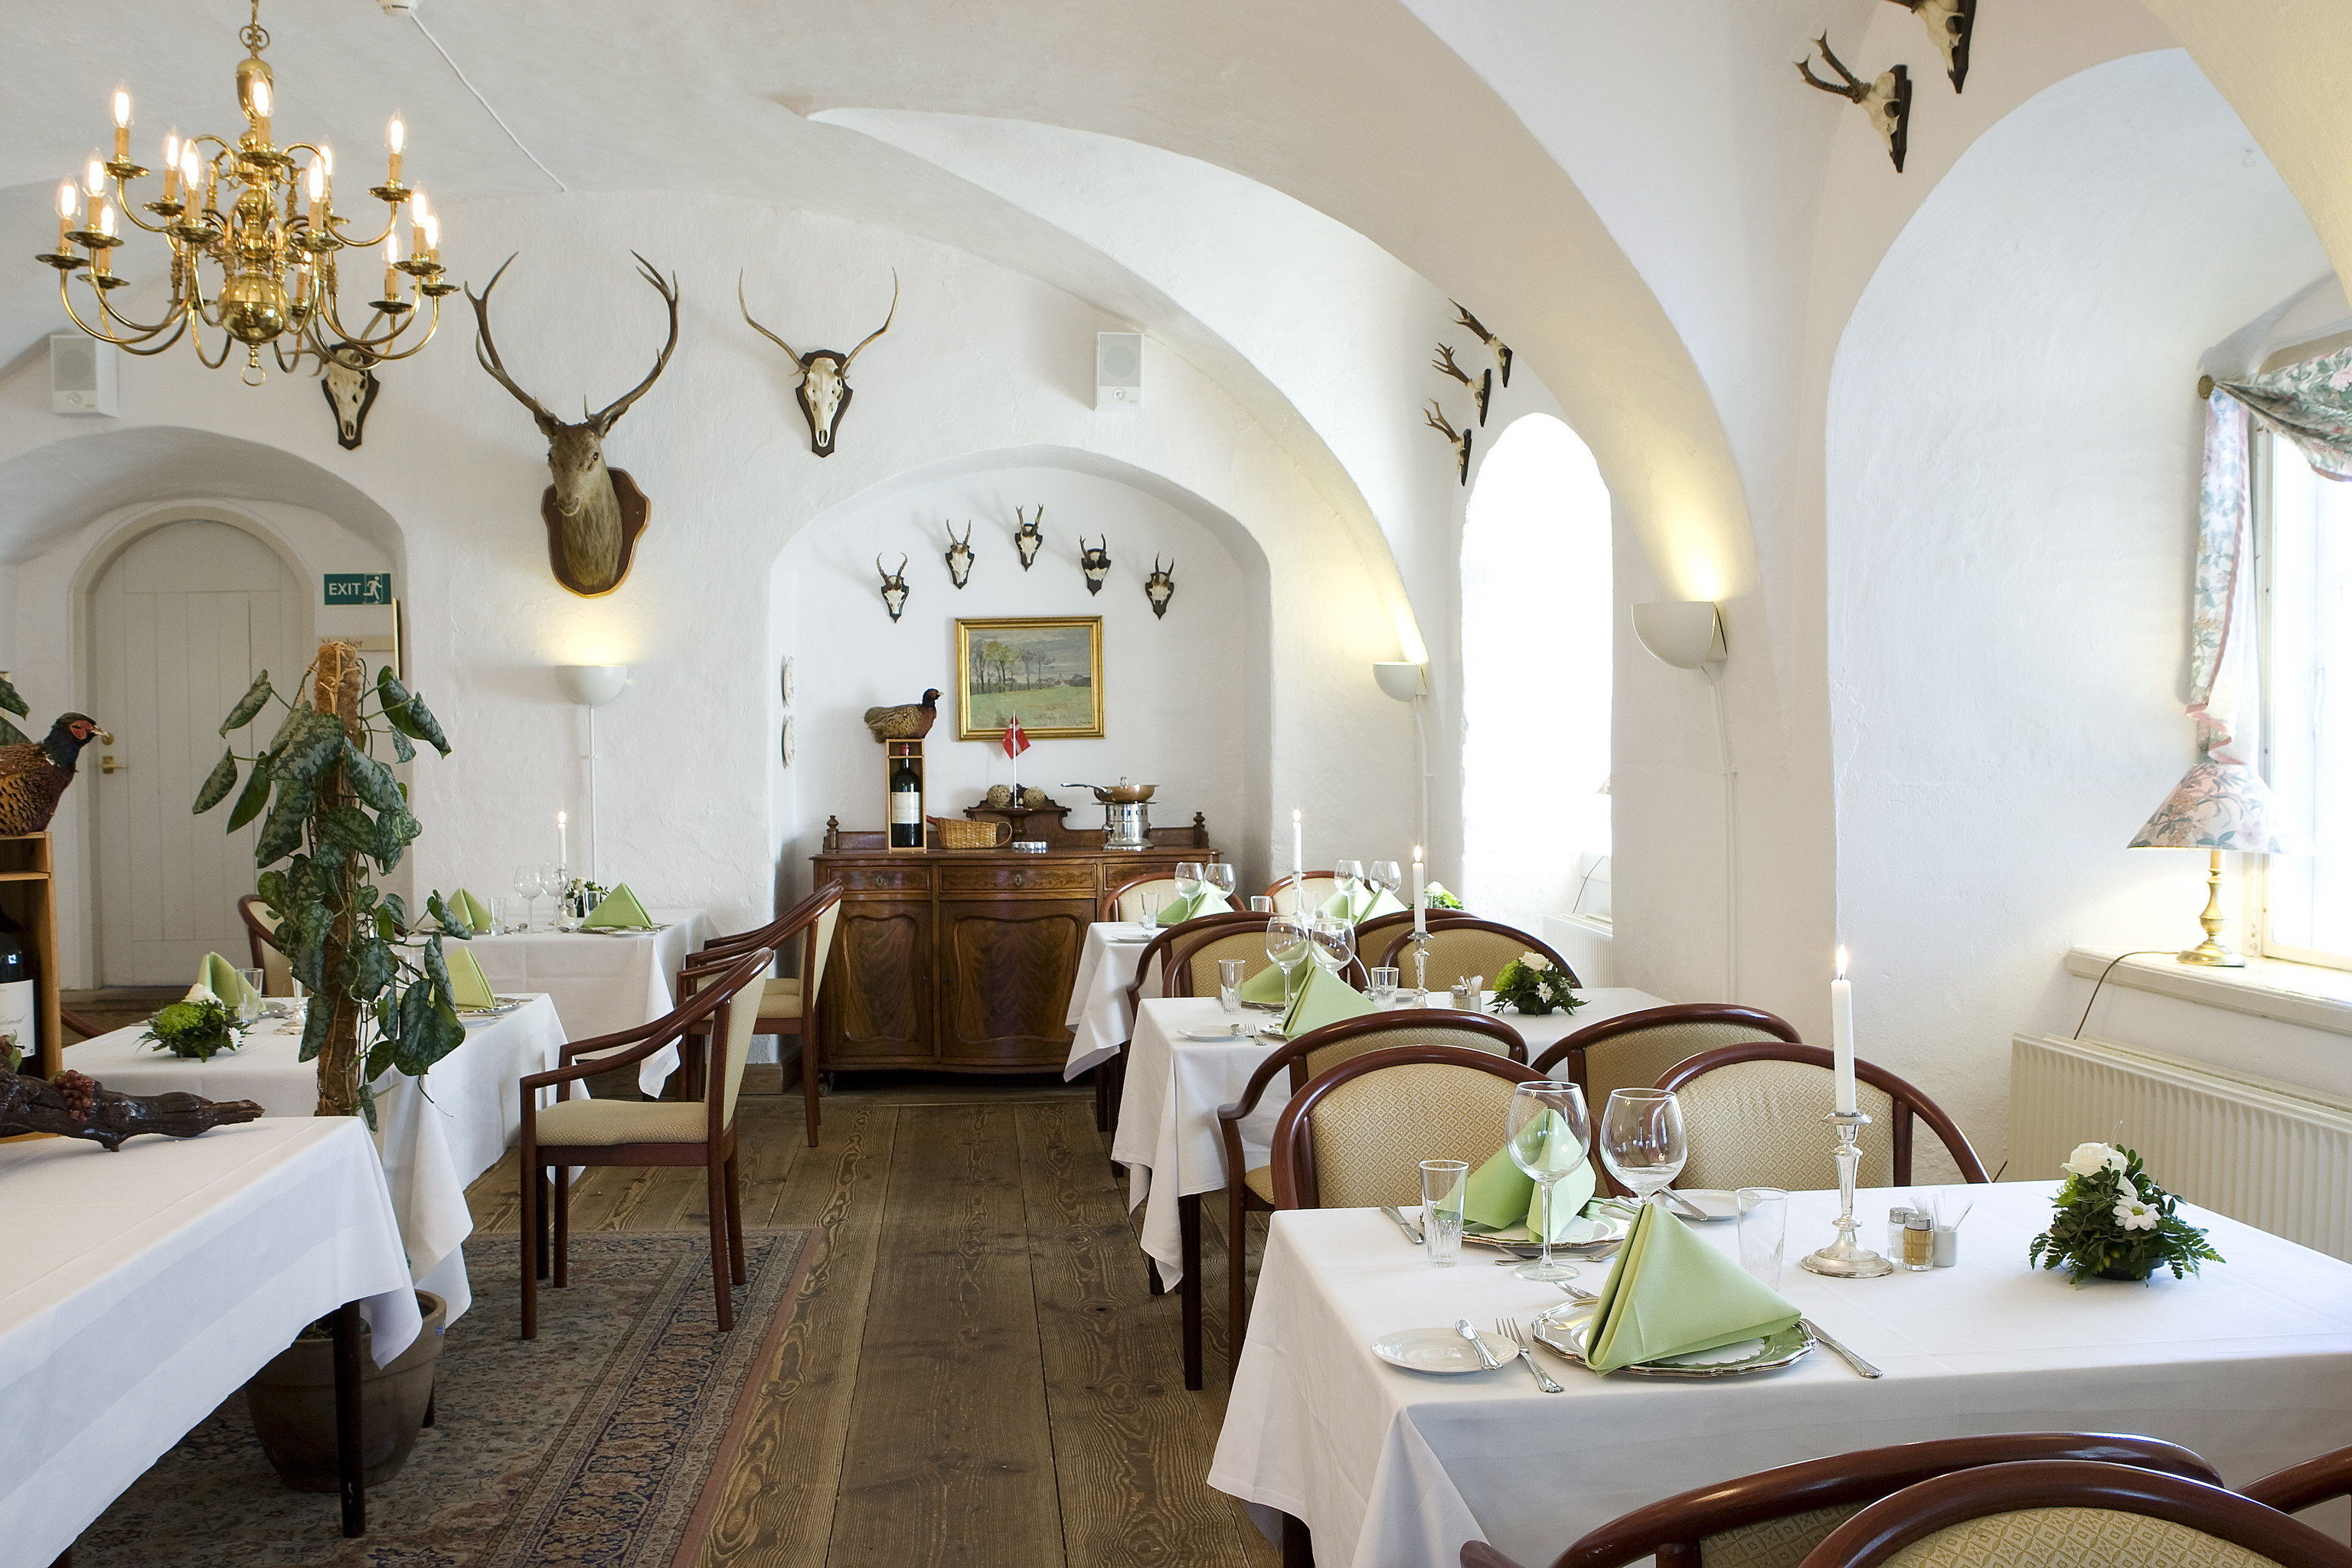 Denmark Finland Hotels Landmarks Luxury Travel Sweden indoor wall table floor restaurant room interior design estate ceiling home real estate dining room Suite furniture decorated